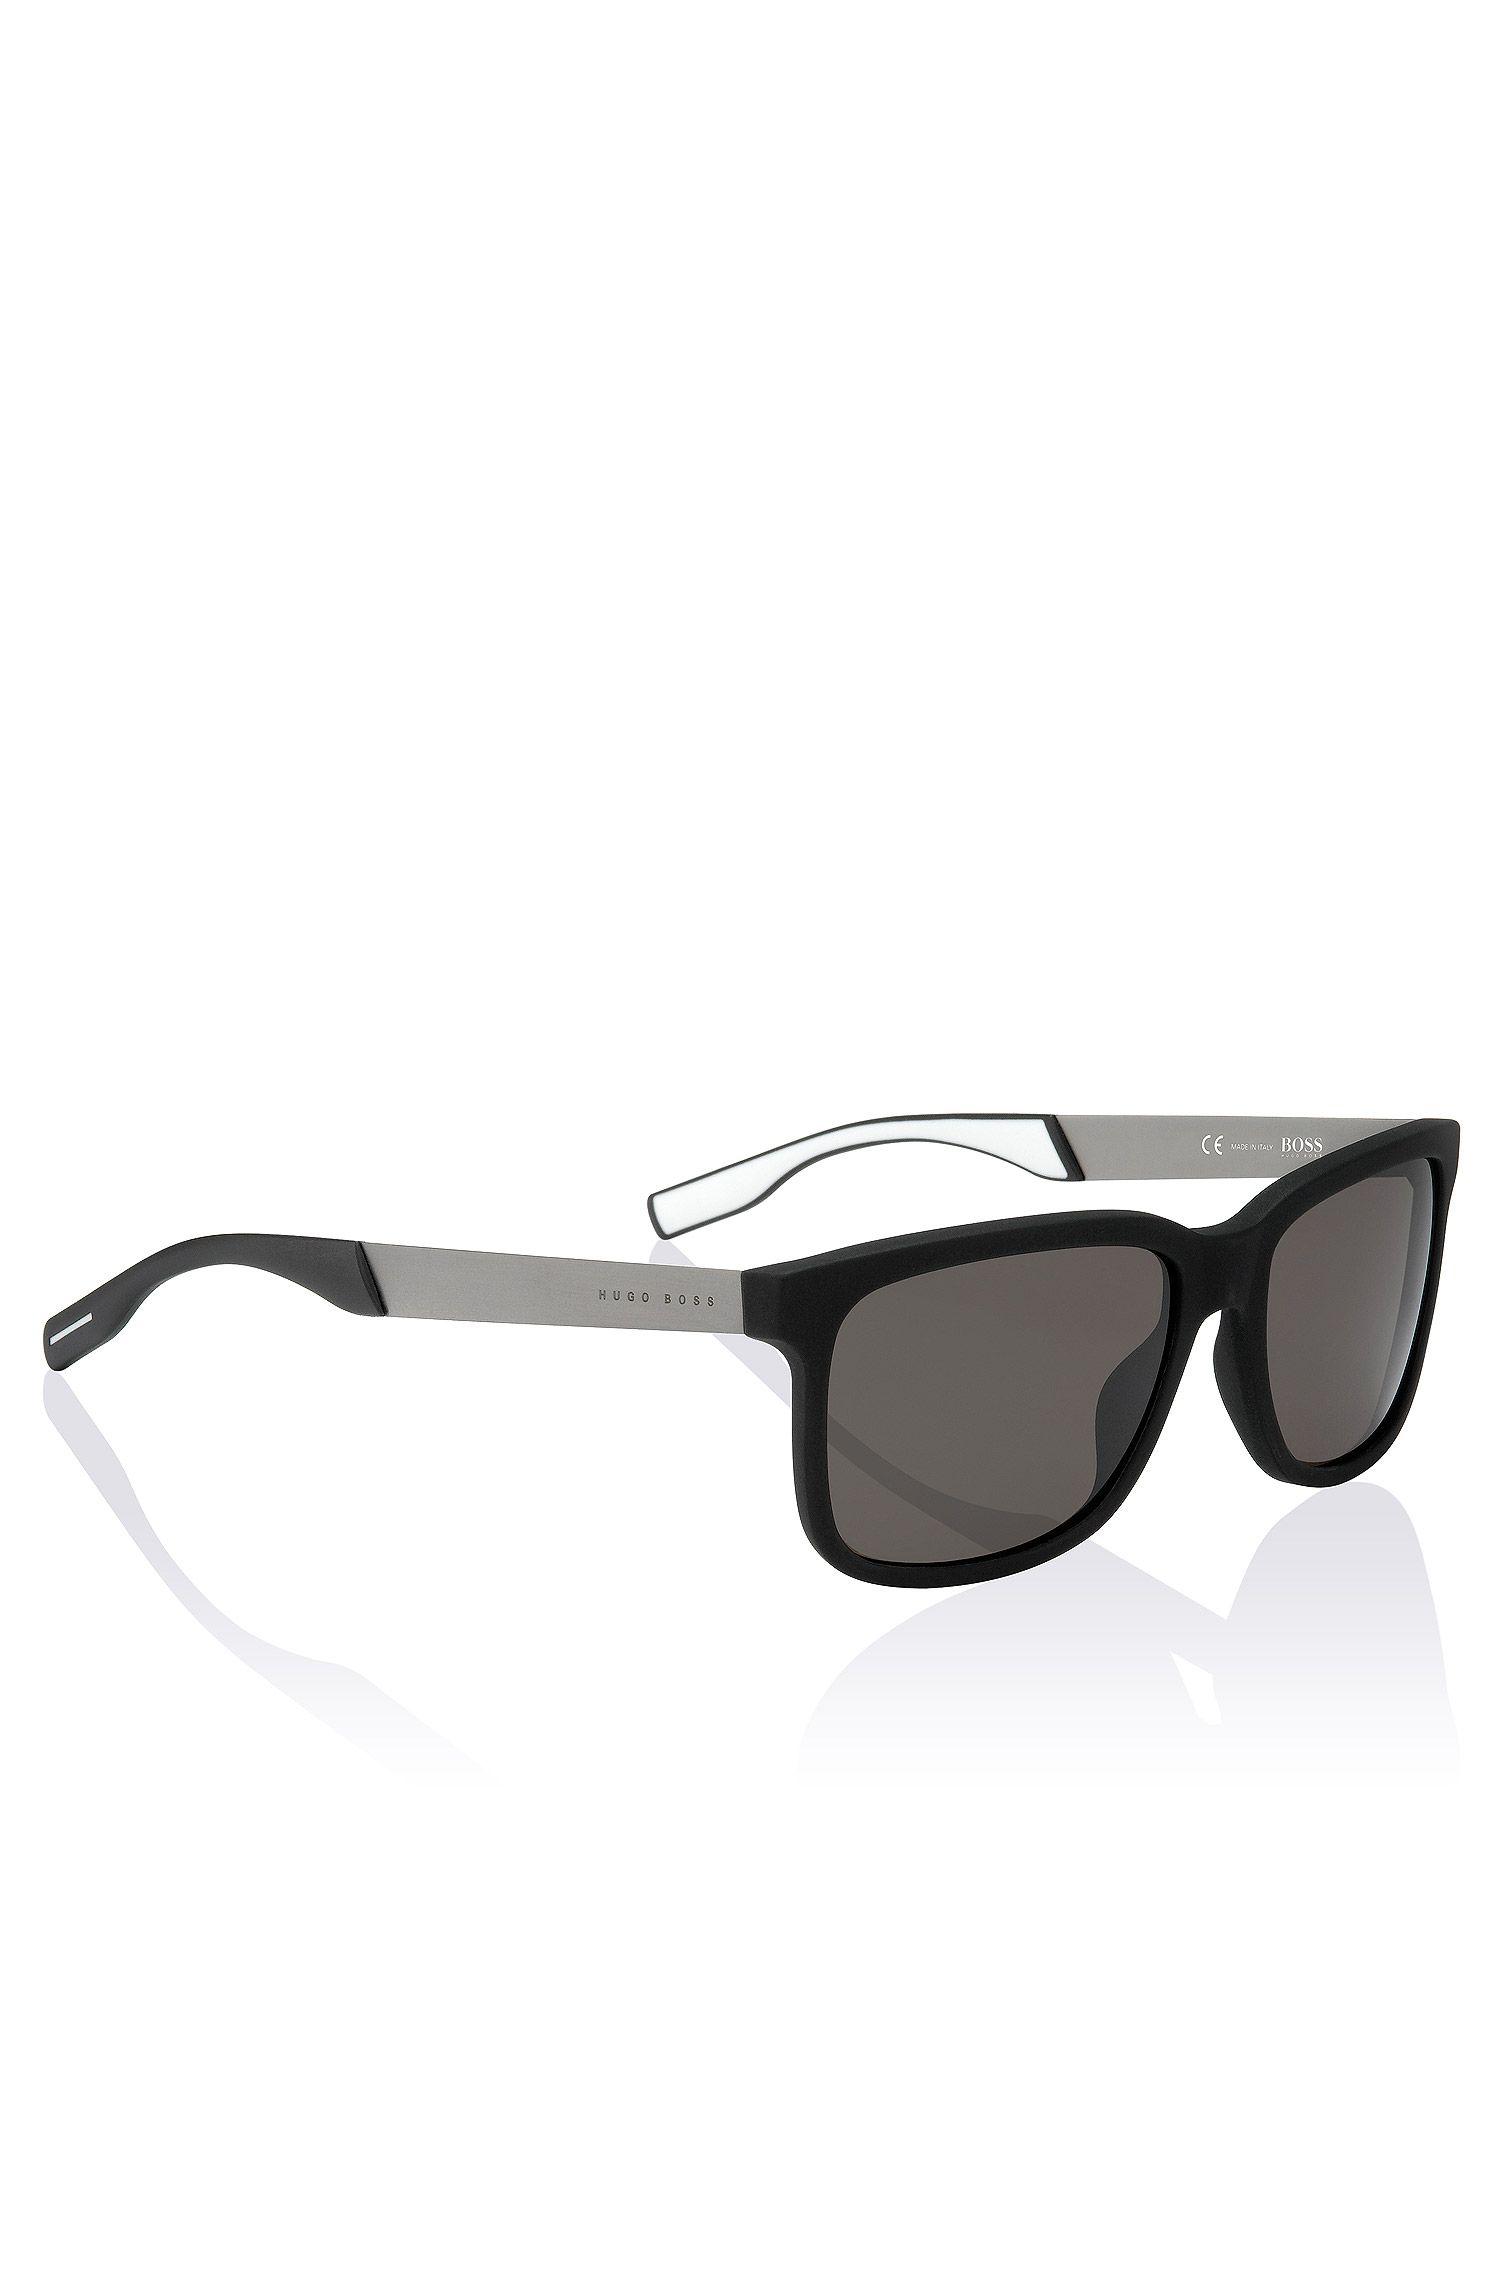 Sonnenbrille ´BOSS 0553/S` aus Edelstahl